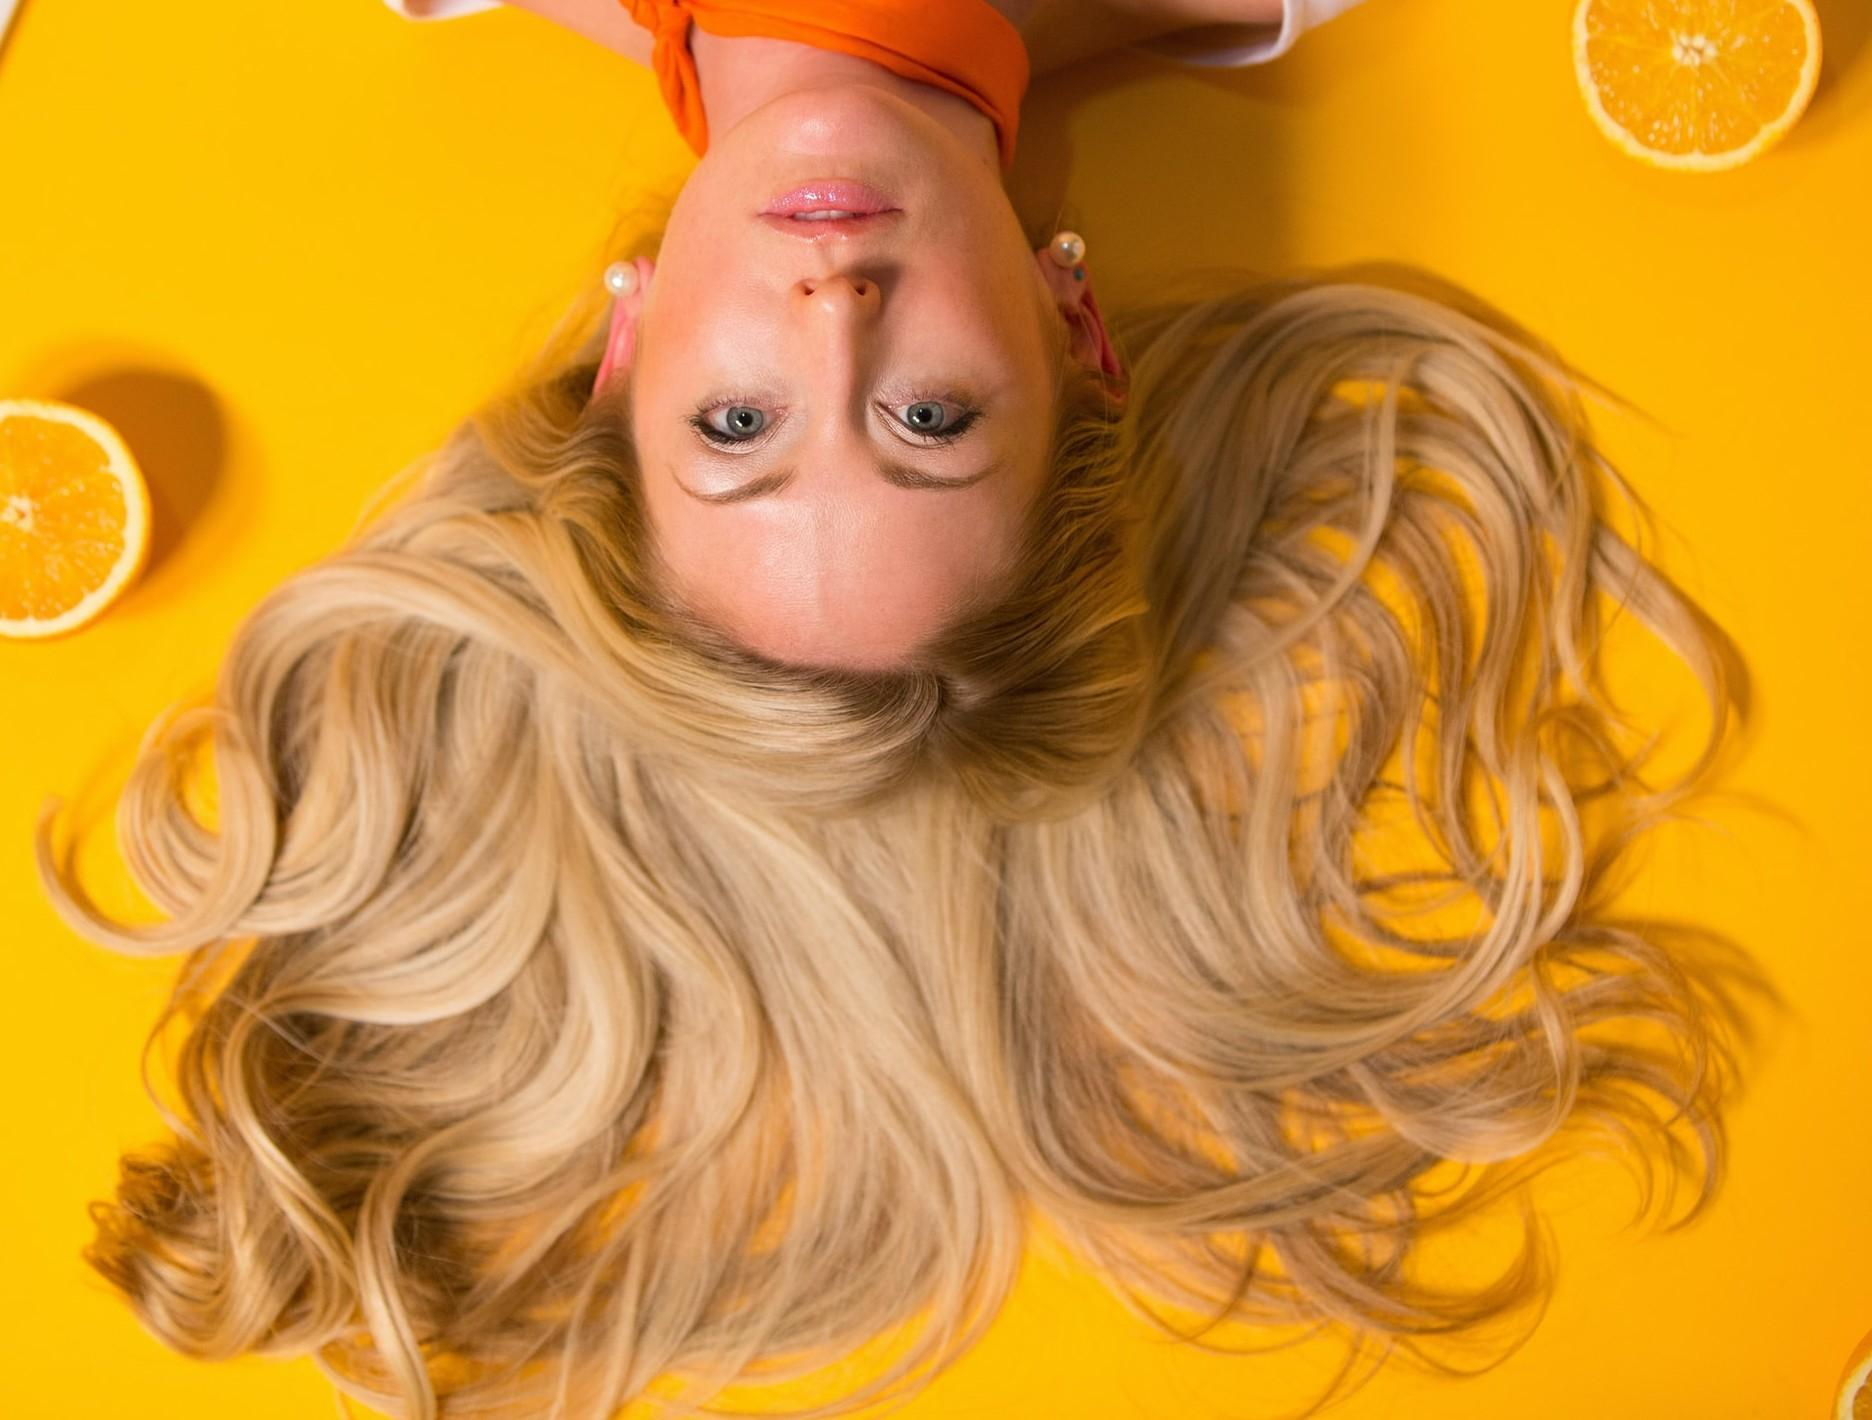 Hiusten vahvistaminen